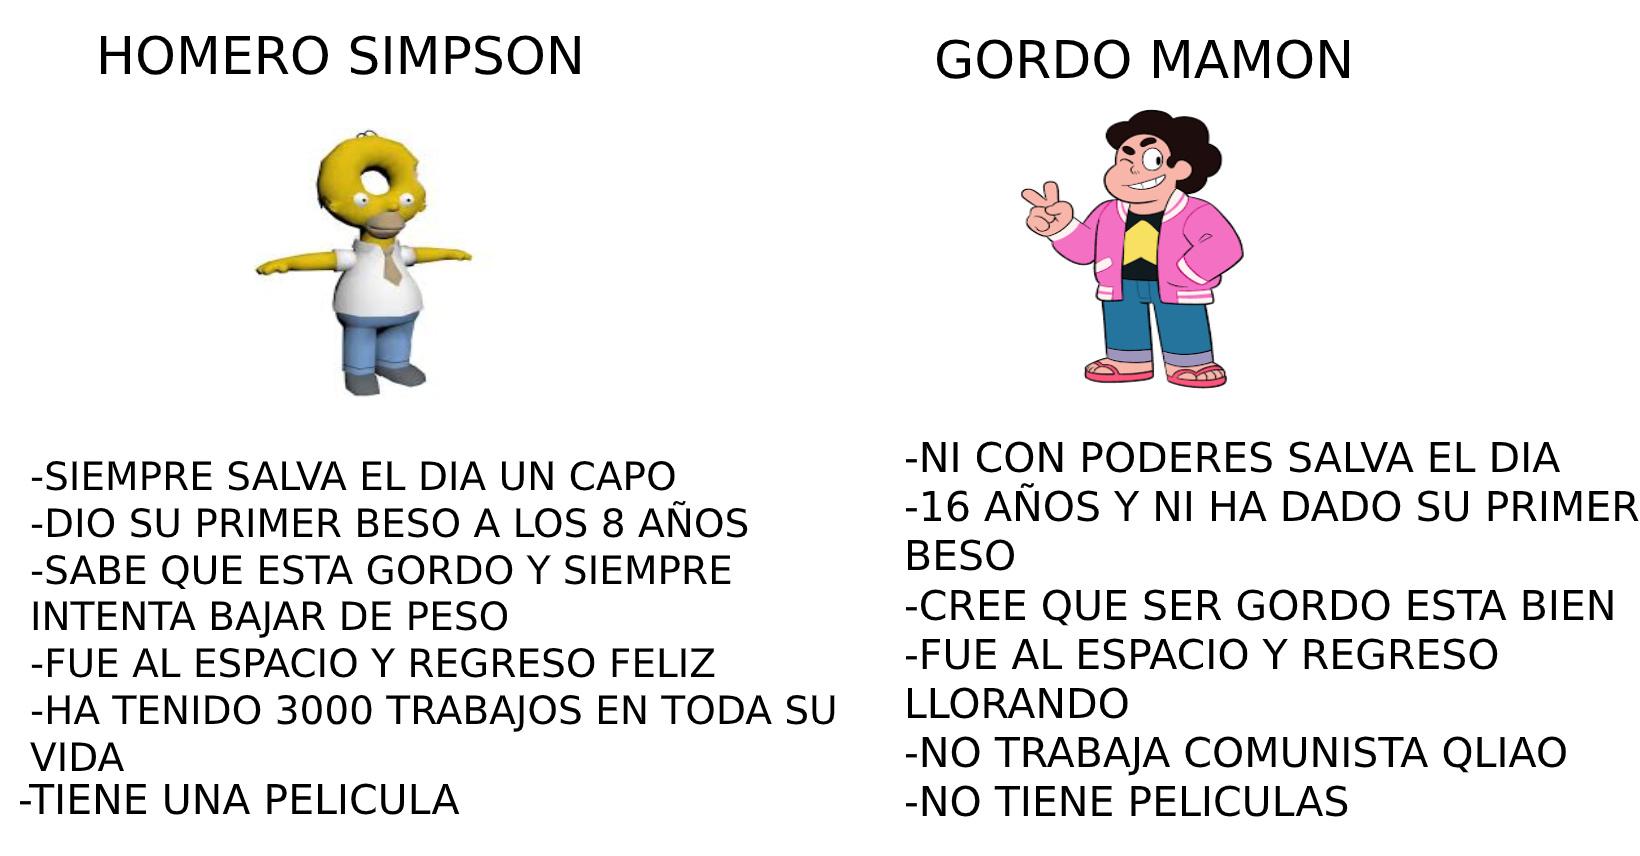 the virgin gordo mamon vs the chad homero simpson - meme